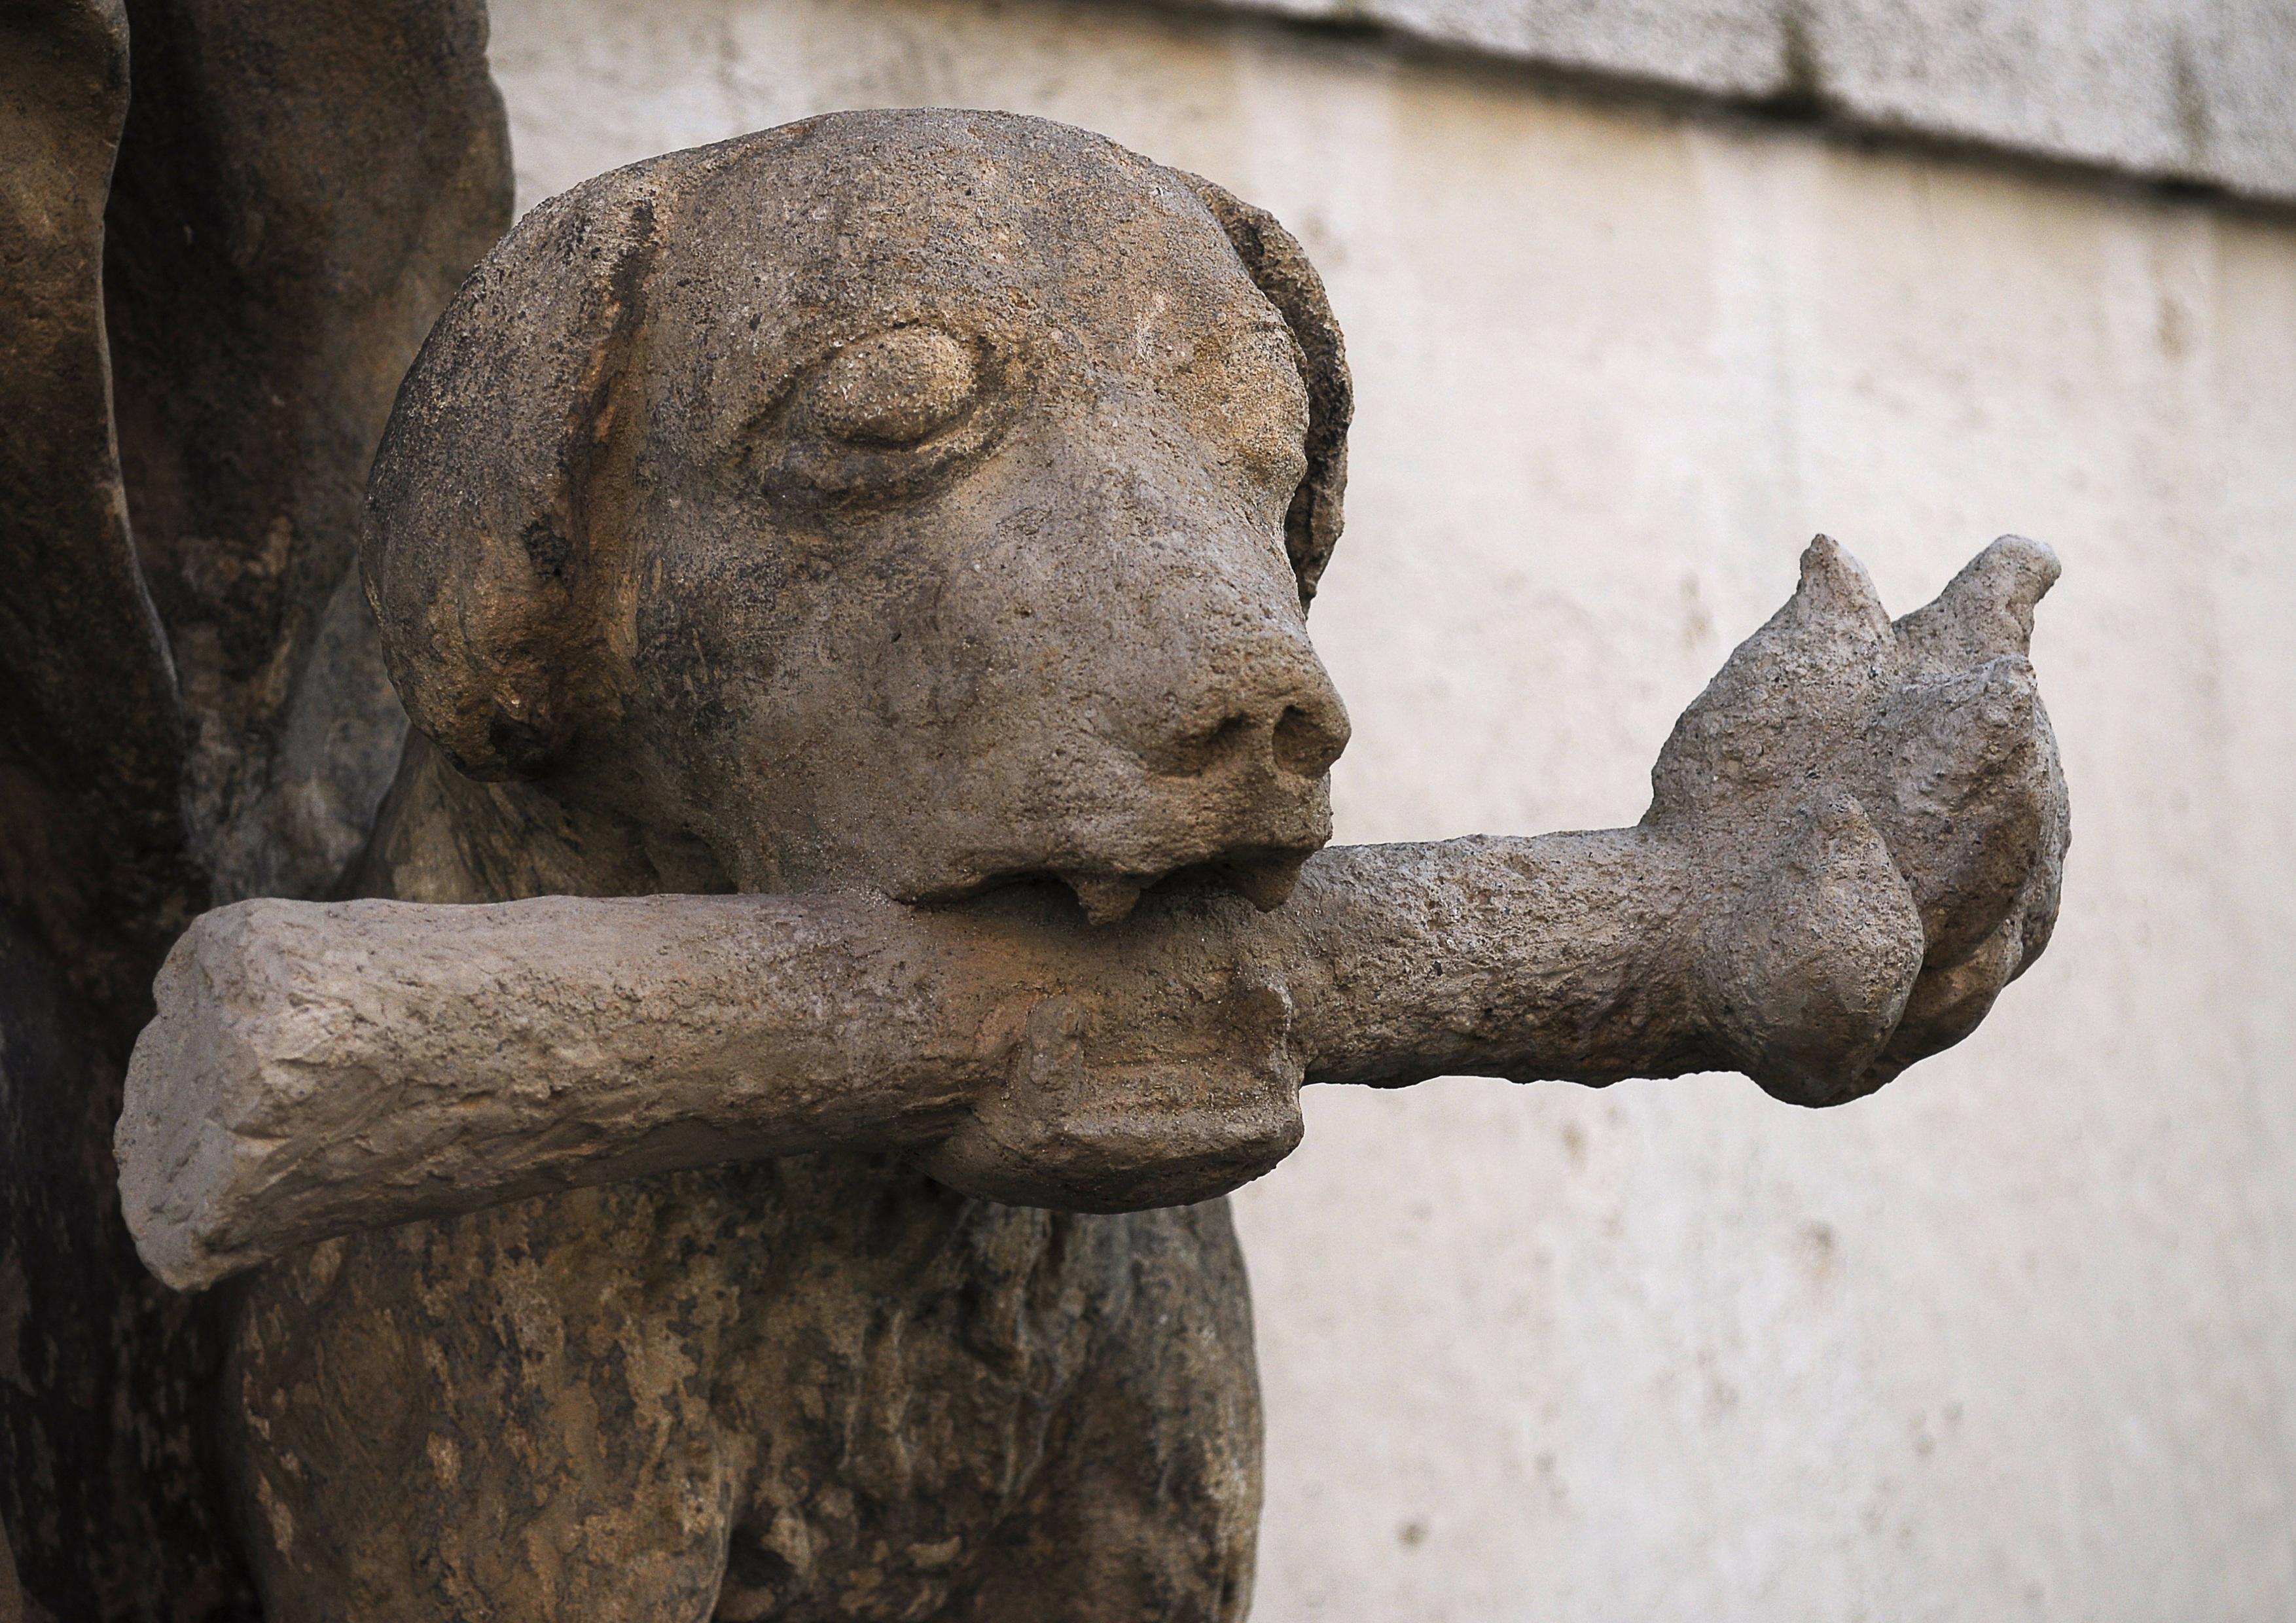 Free Images : rock, wood, dog, monument, statue, torch, gargoyle ...